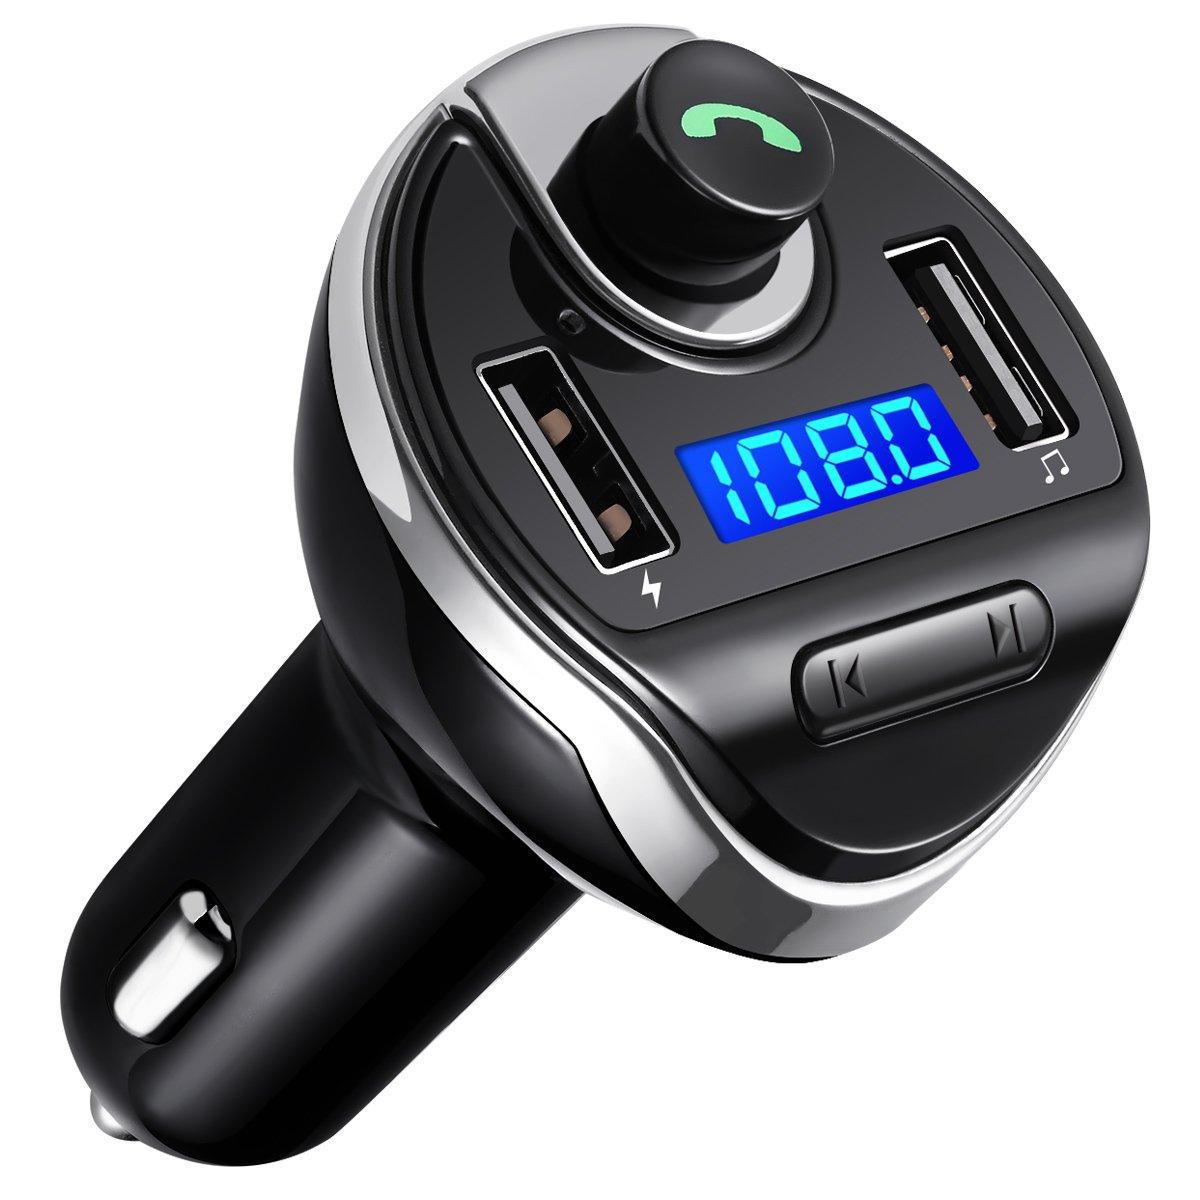 ea00f57889c Amazon.com  Criacr Bluetooth FM Transmitter for Car